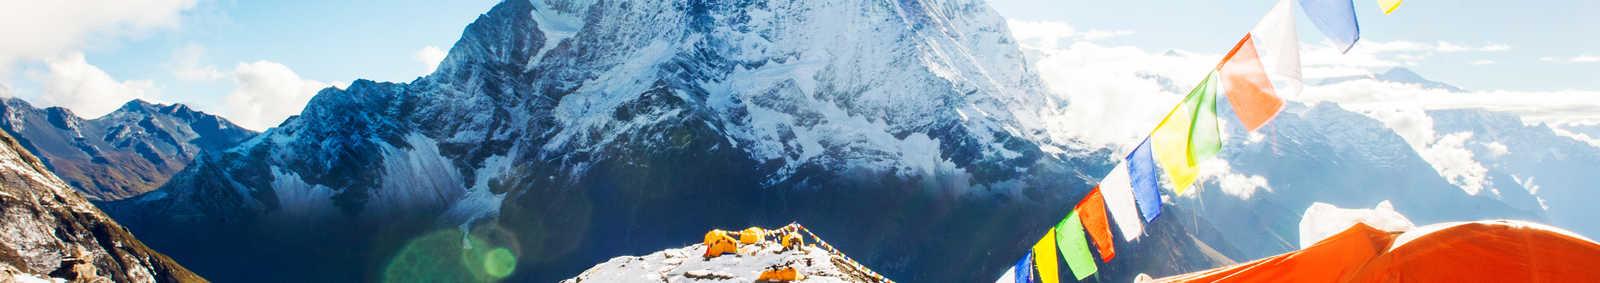 Mount Everest Trail